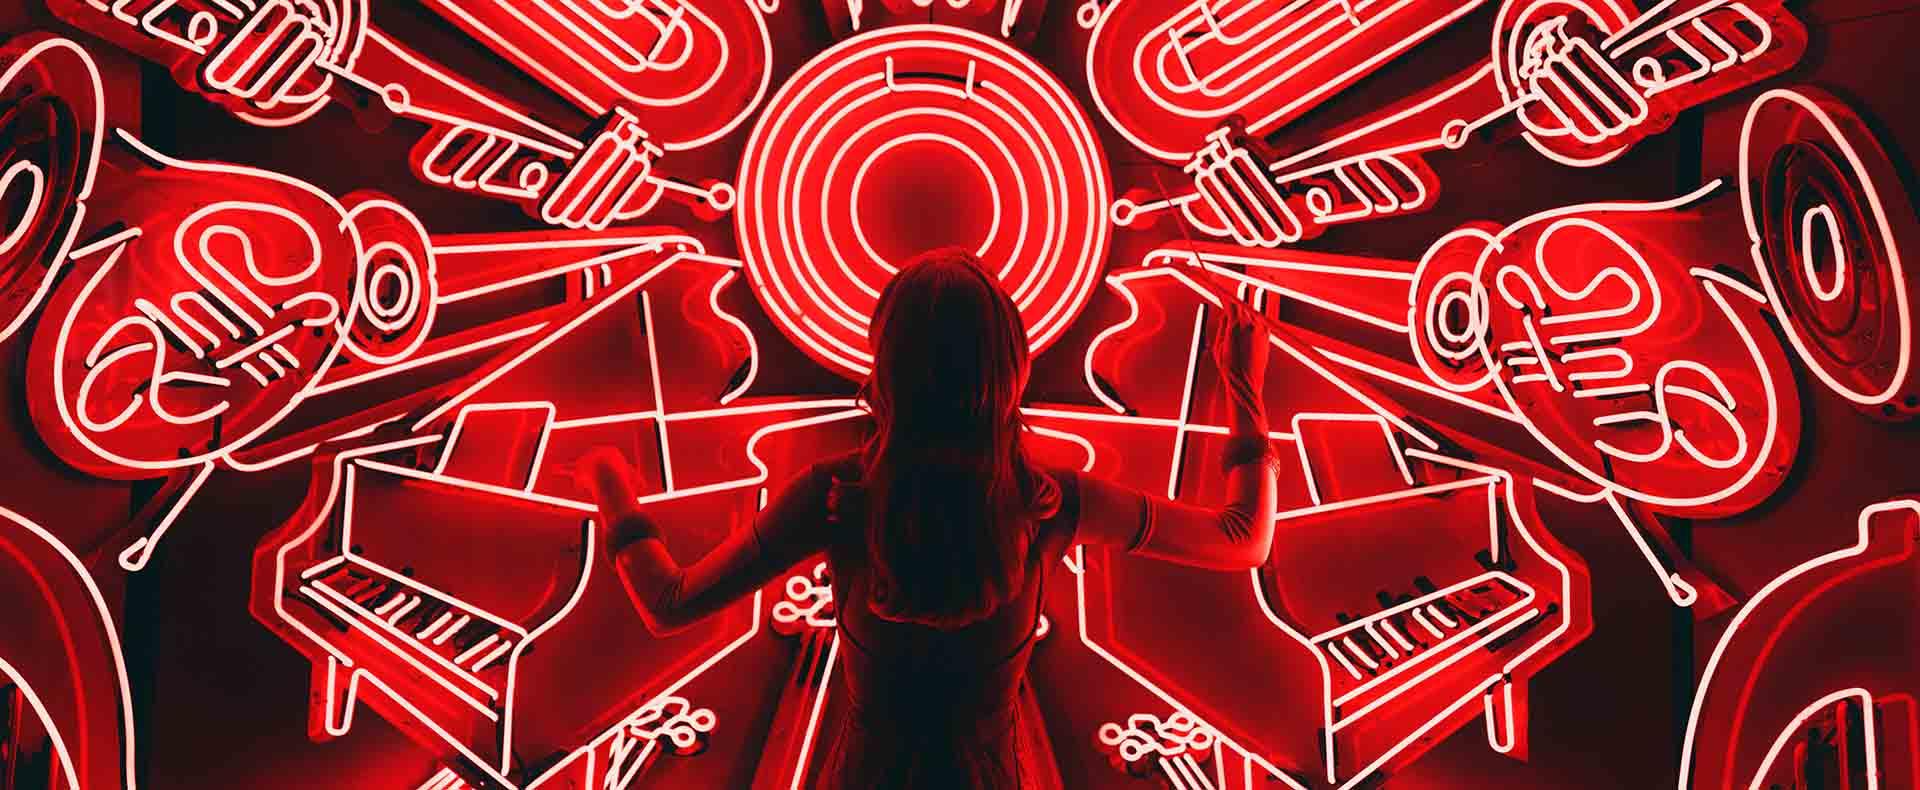 Musica Biohacking luce rossa